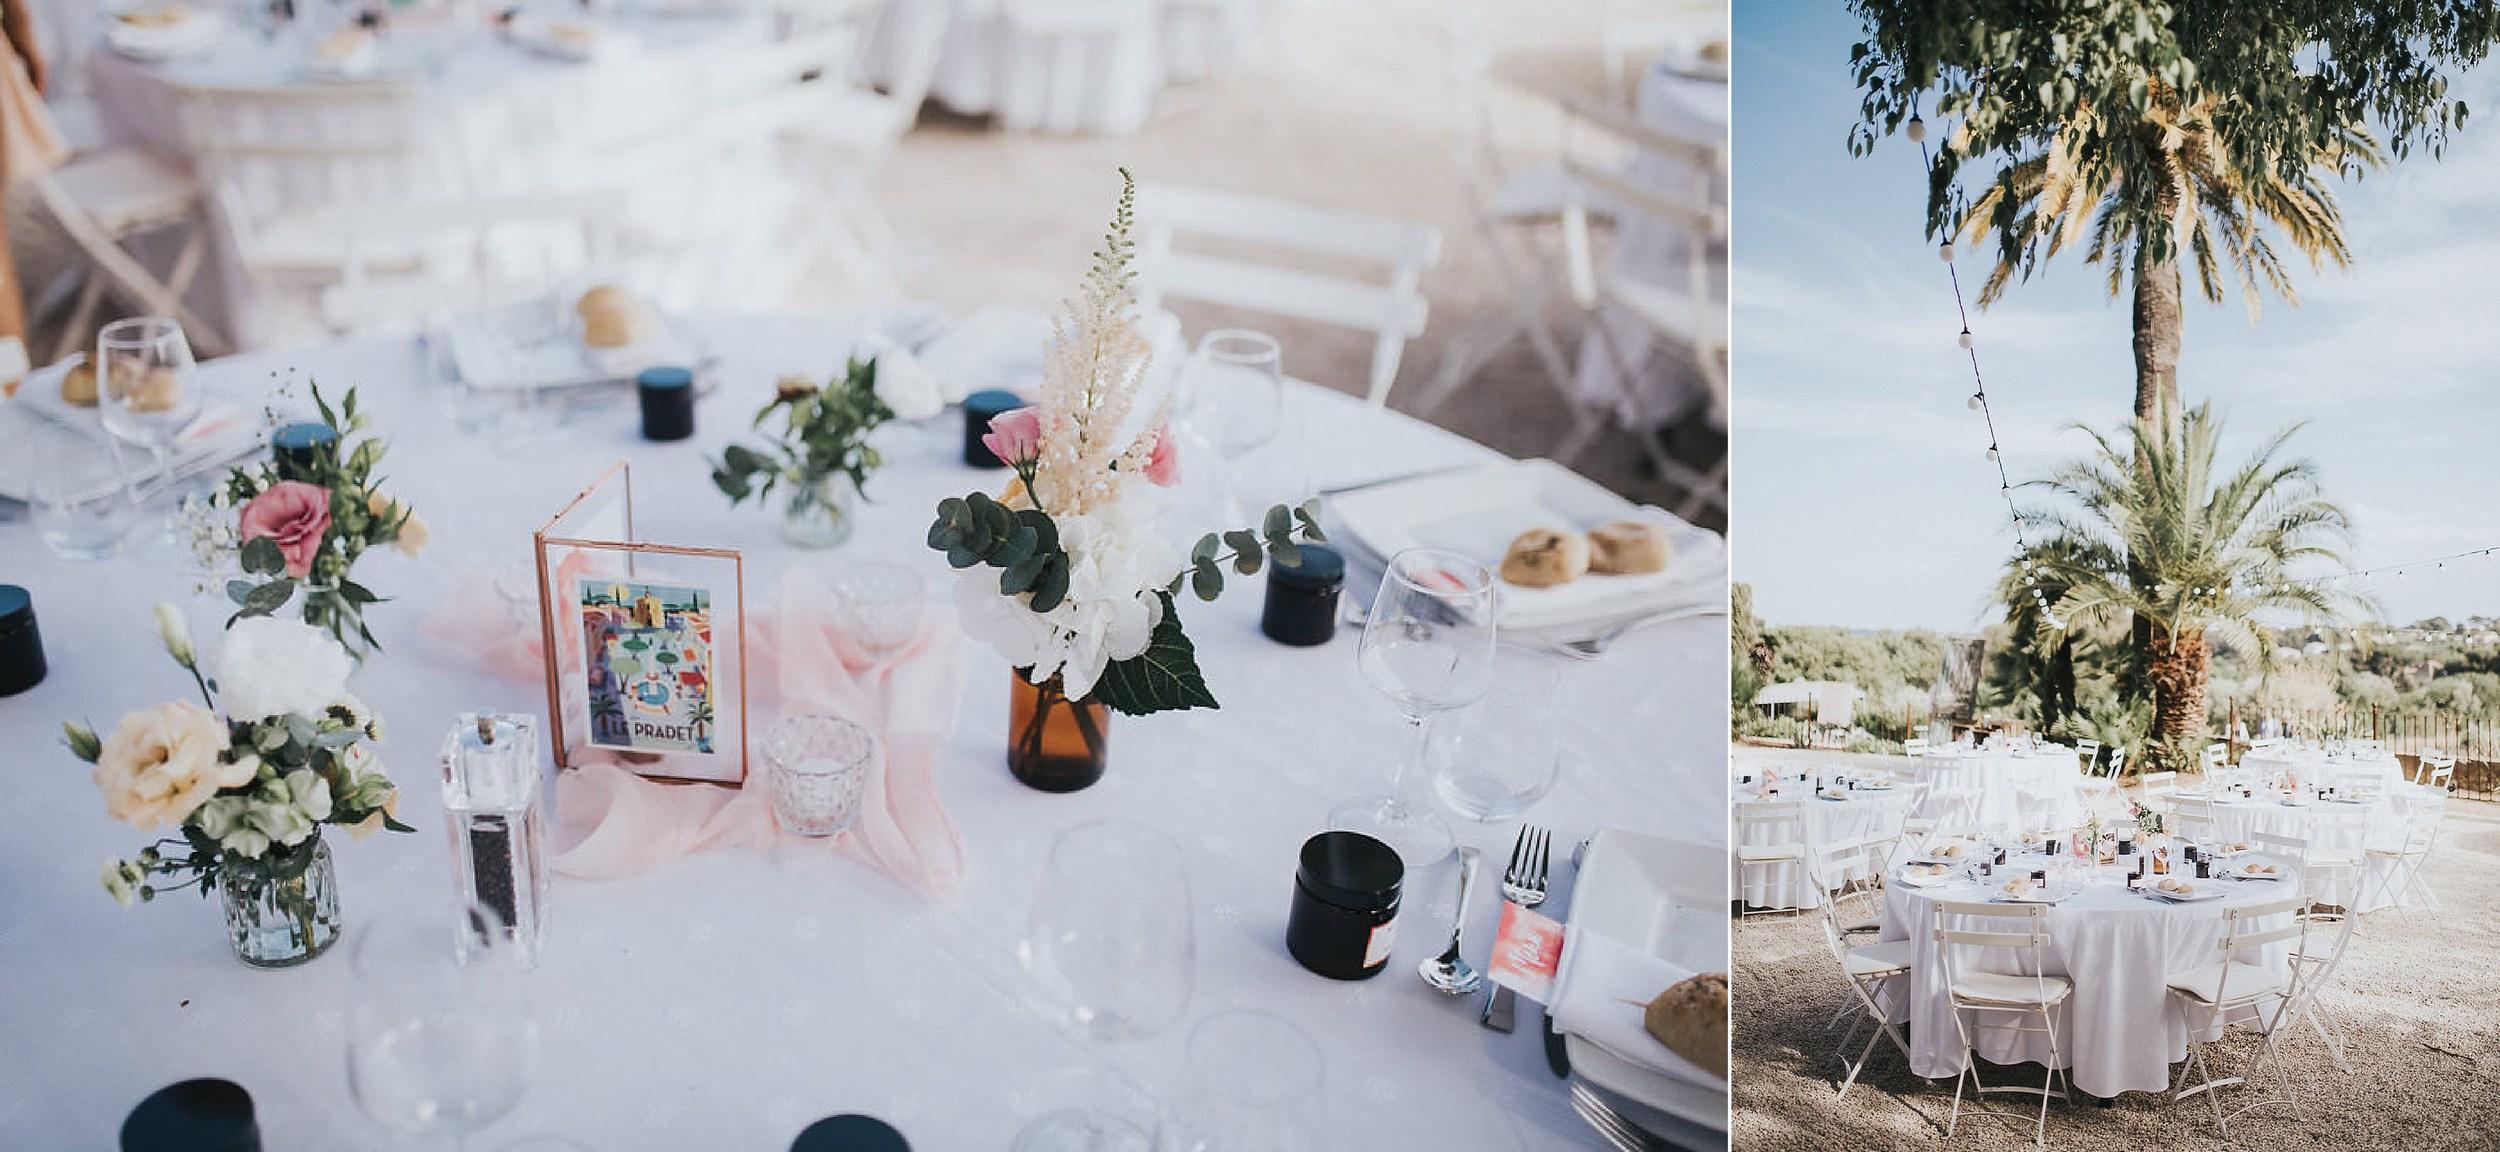 mariage-hyeres-villa-brignac-steven-bassillieaux-bordeaux-dordogne-wedding-photographe87.jpg